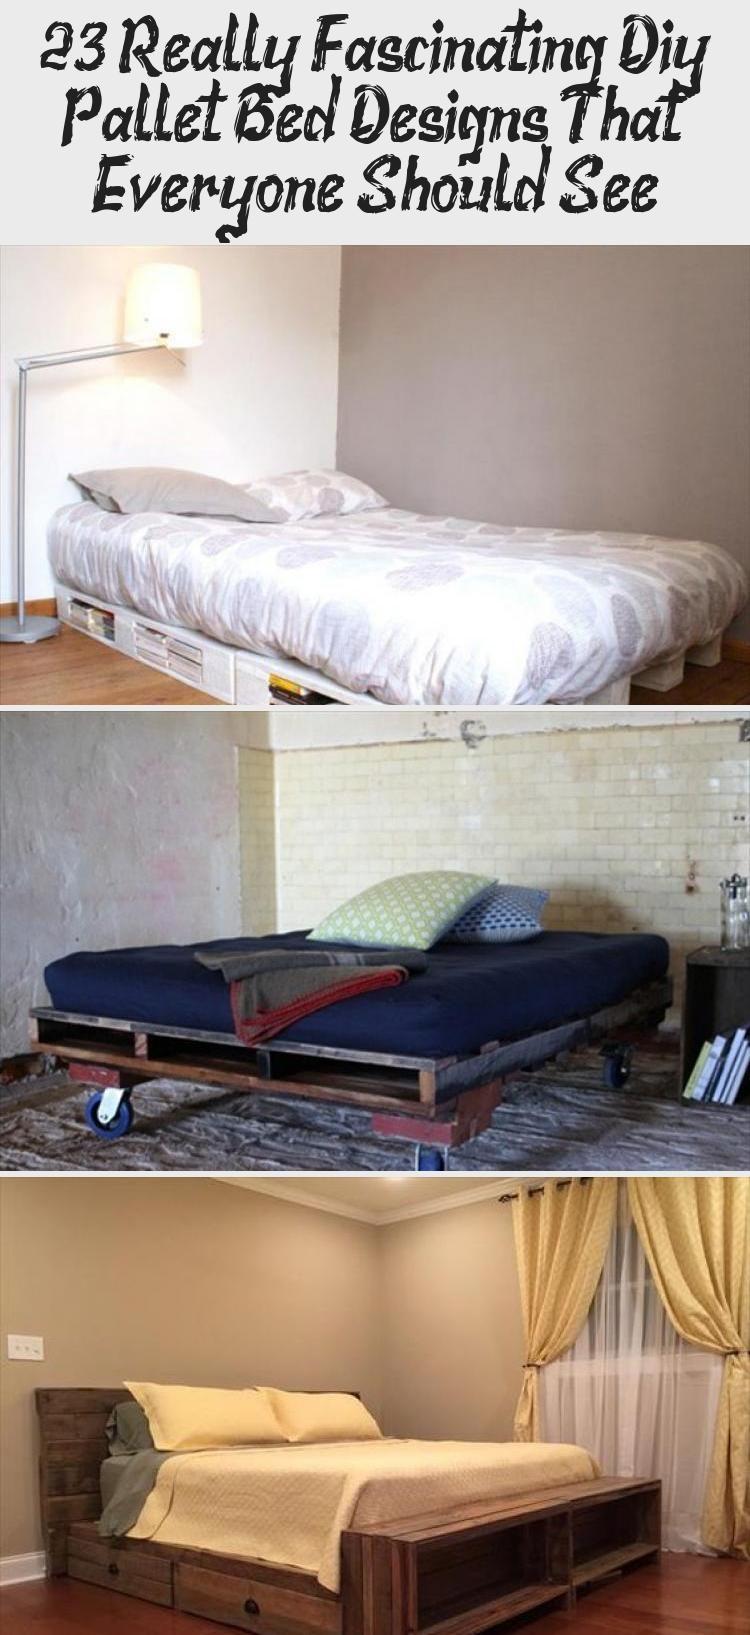 23 Really Fascinating Diy Pallet Bed Designs That Everyone Should See Diy Pallet Bed Bed Frame Headboard Bed Design